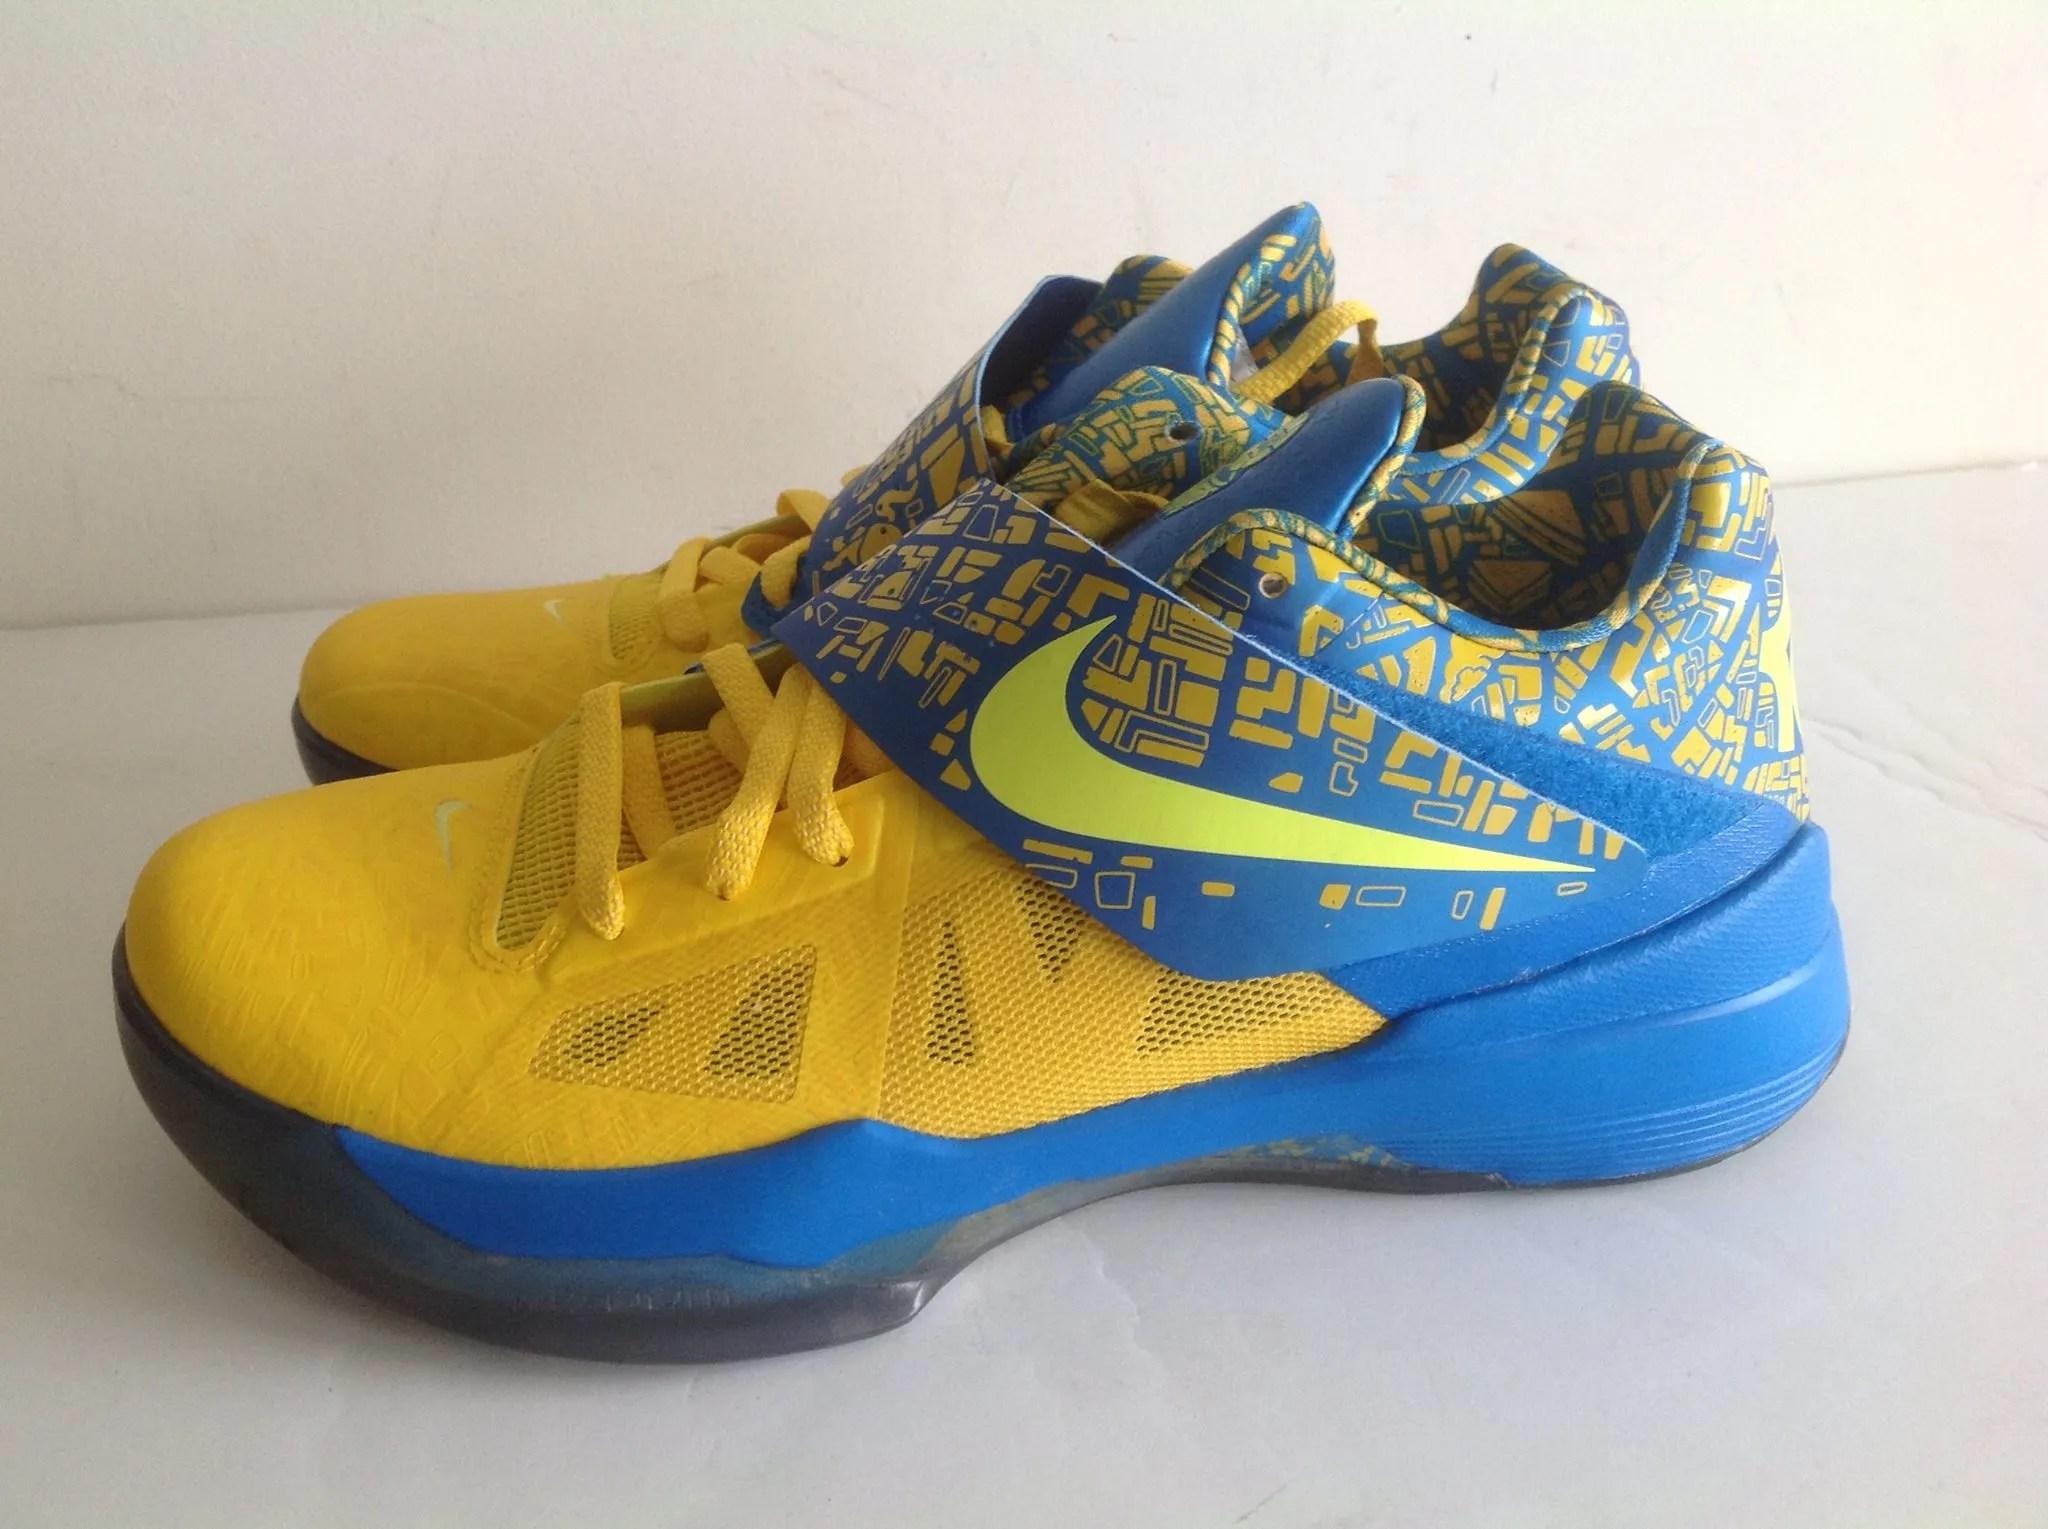 3dea78cc979 Kd 5 Nike Own Your Make